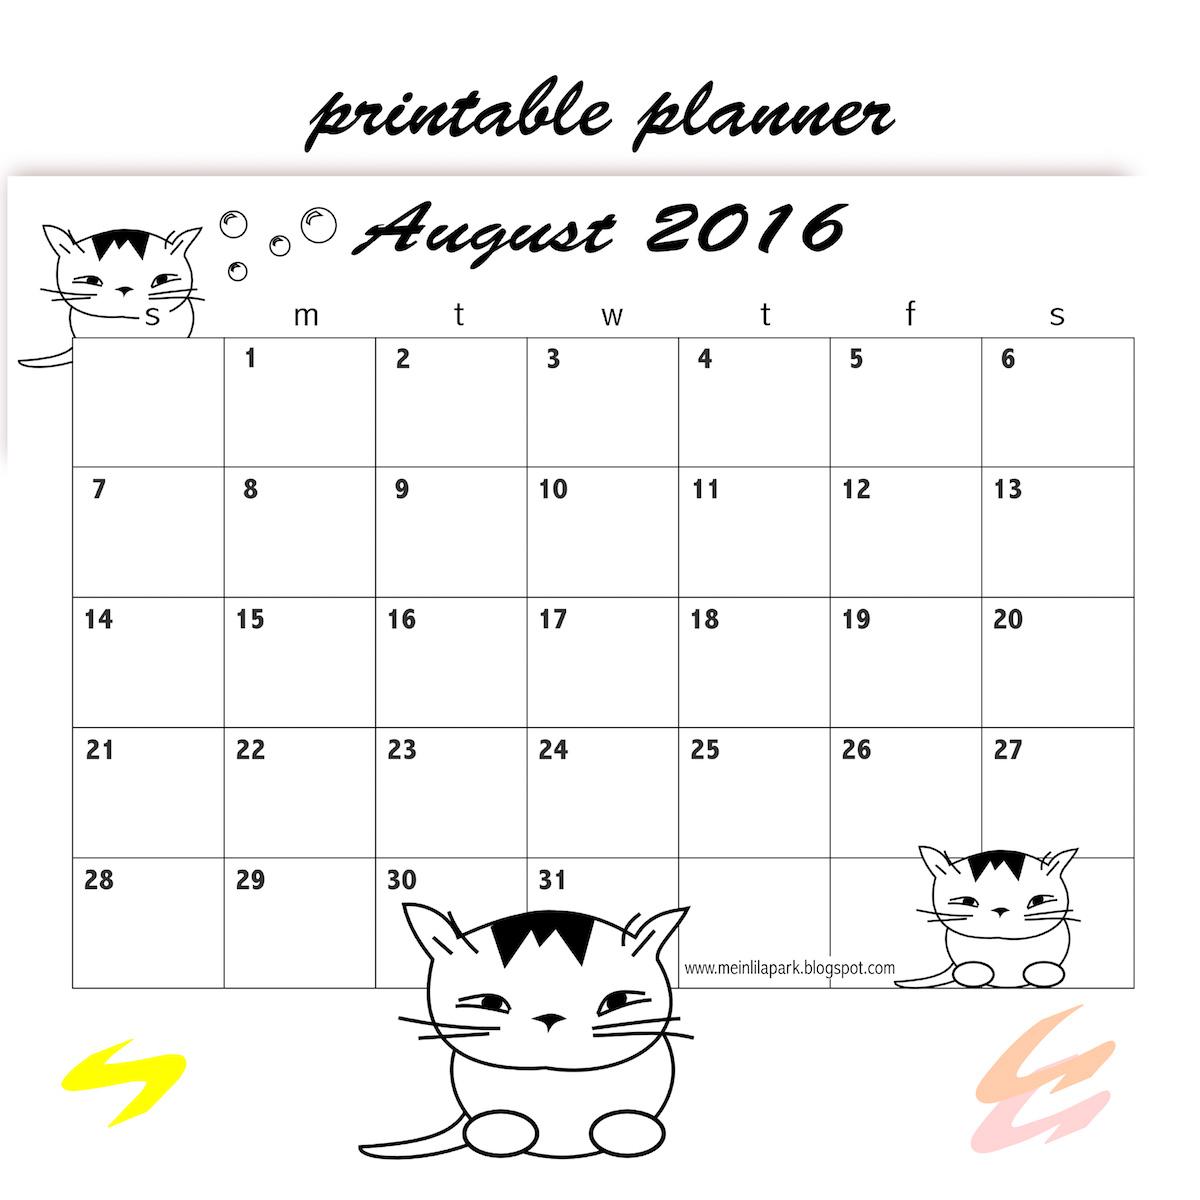 Fillable Monthly Calendar Printable | Calendar Template 2016